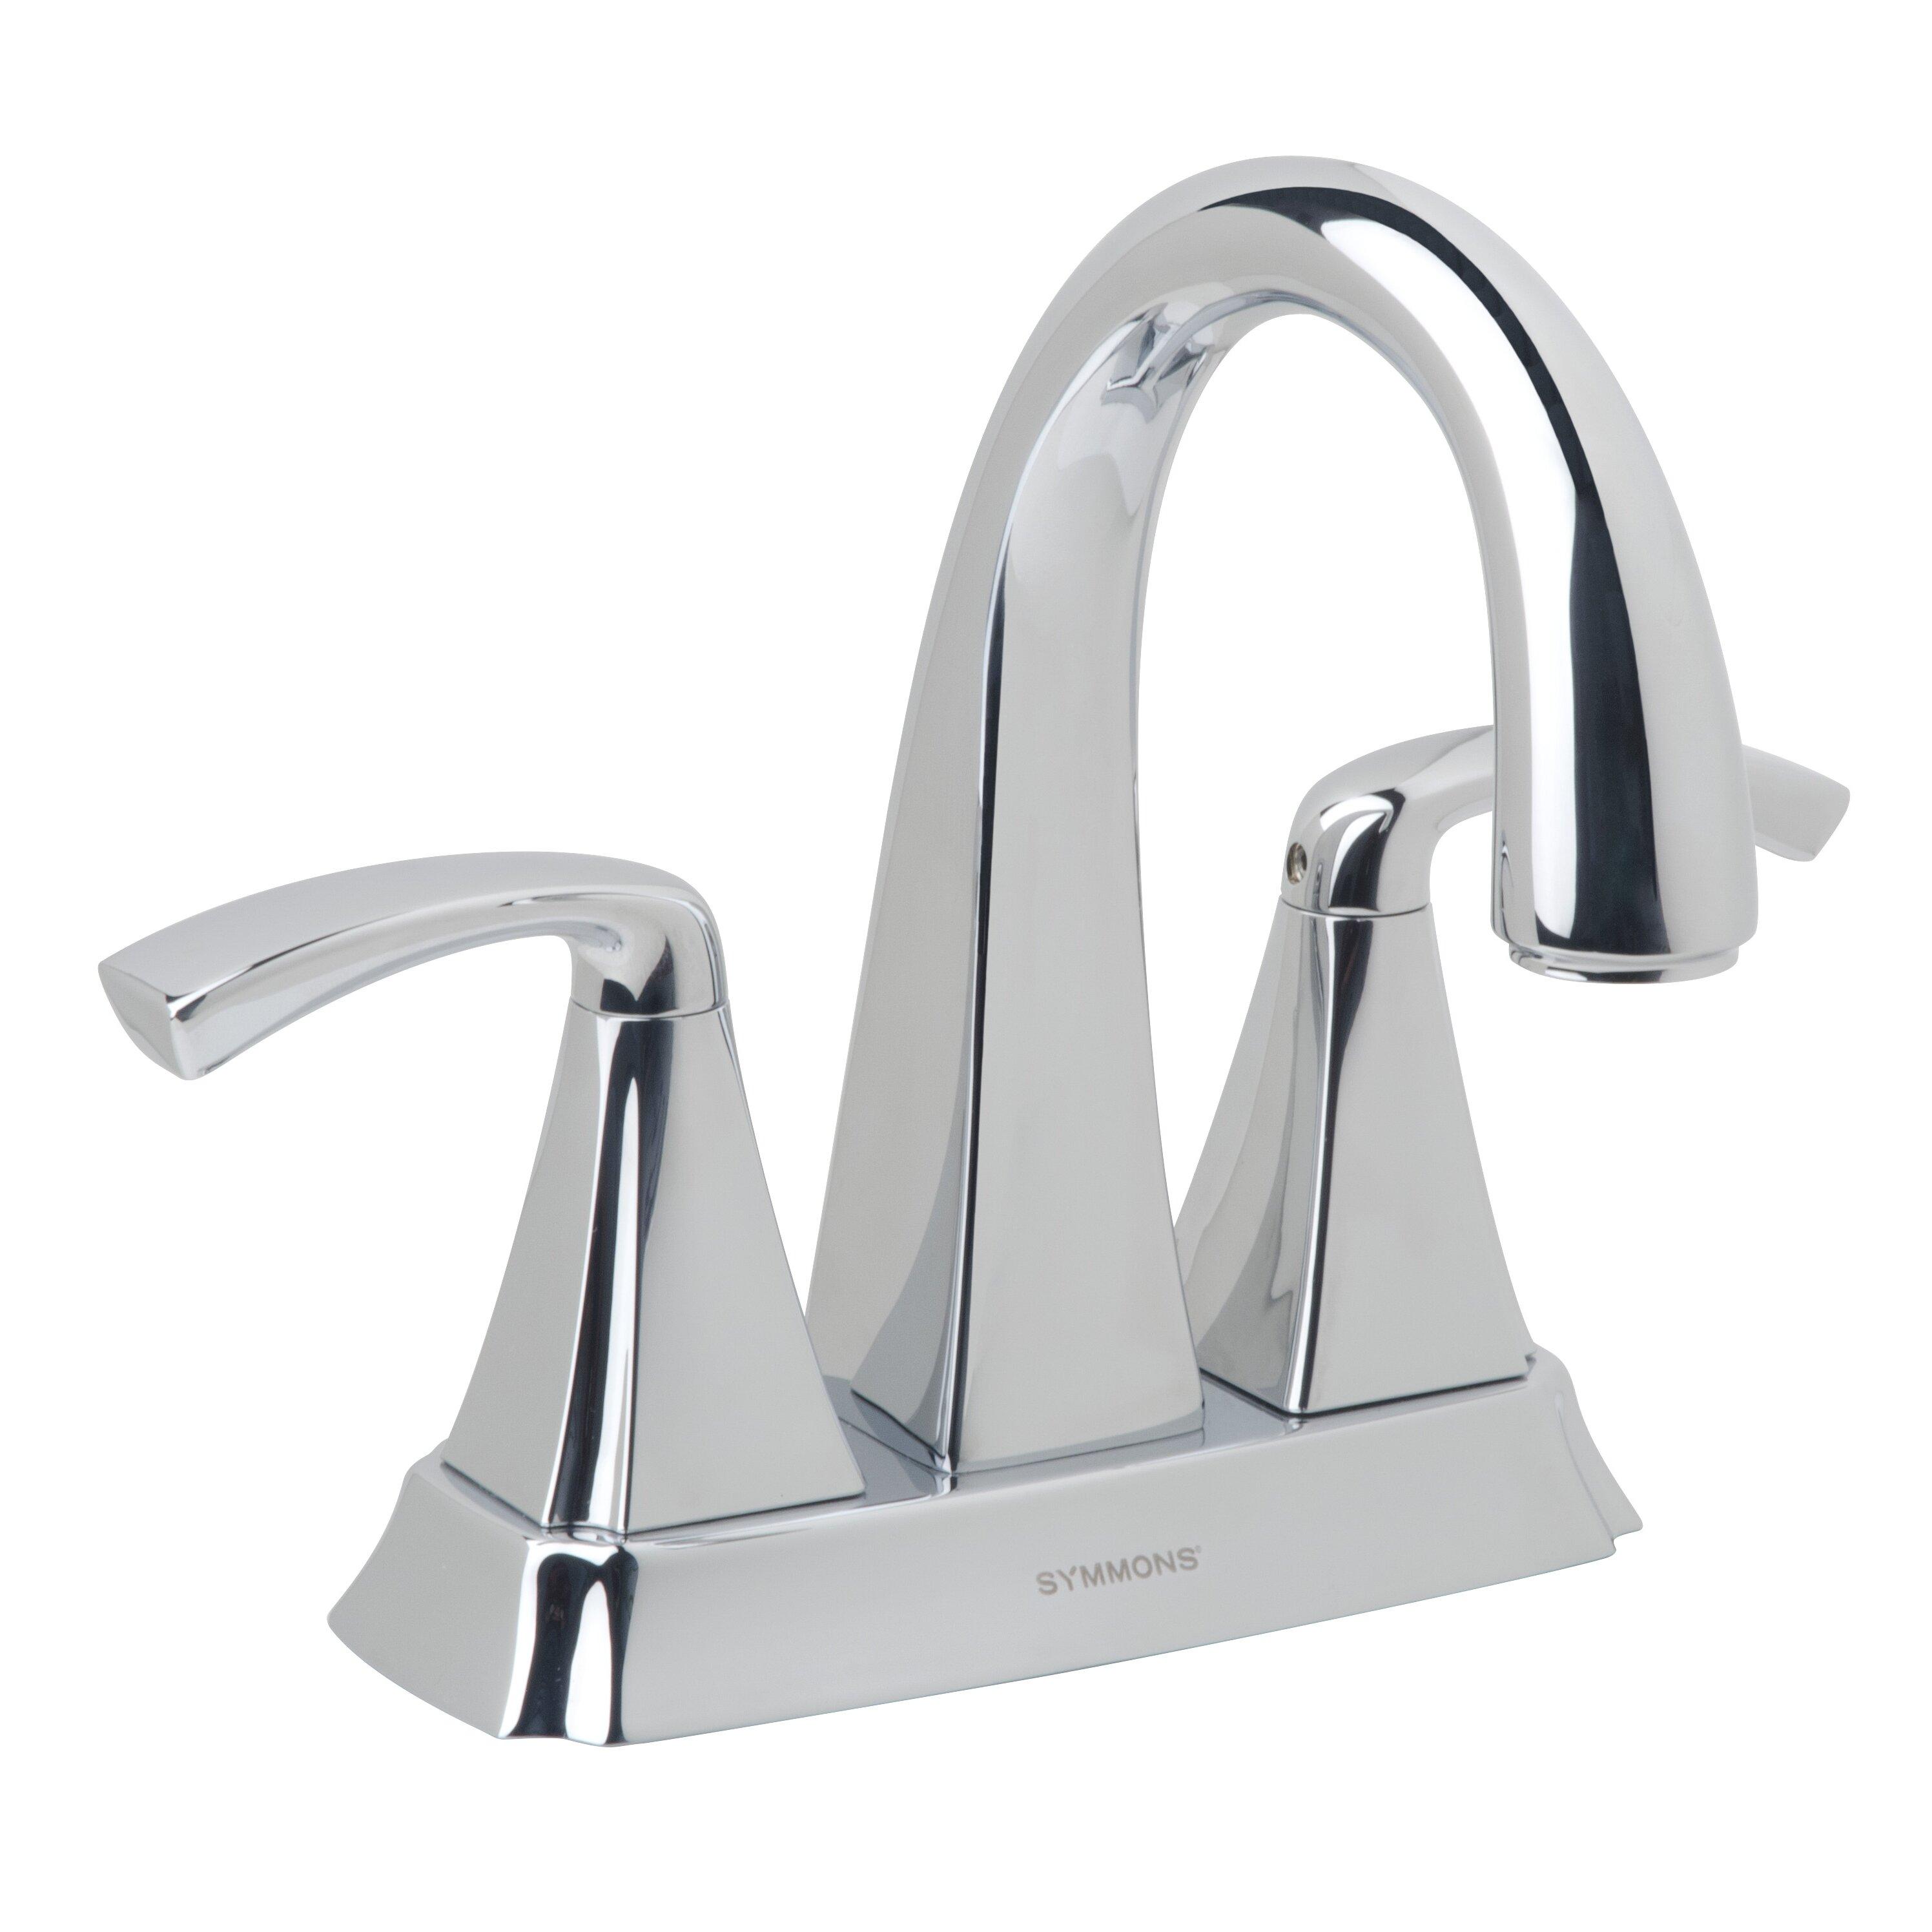 symmons bramwell handle centerset bathroom faucet